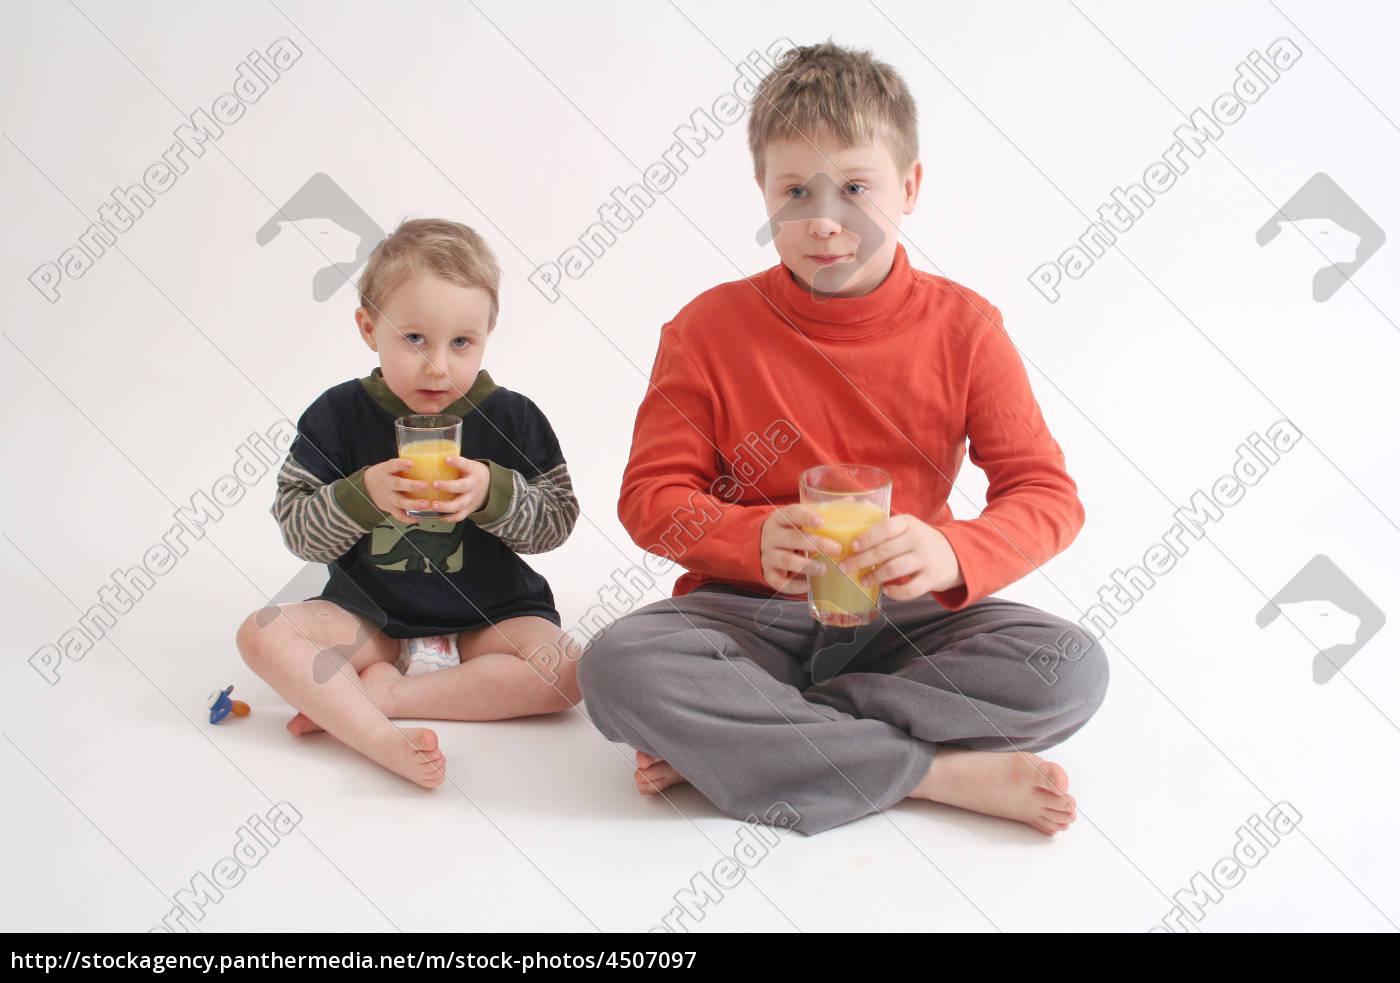 drinking, juice - 4507097